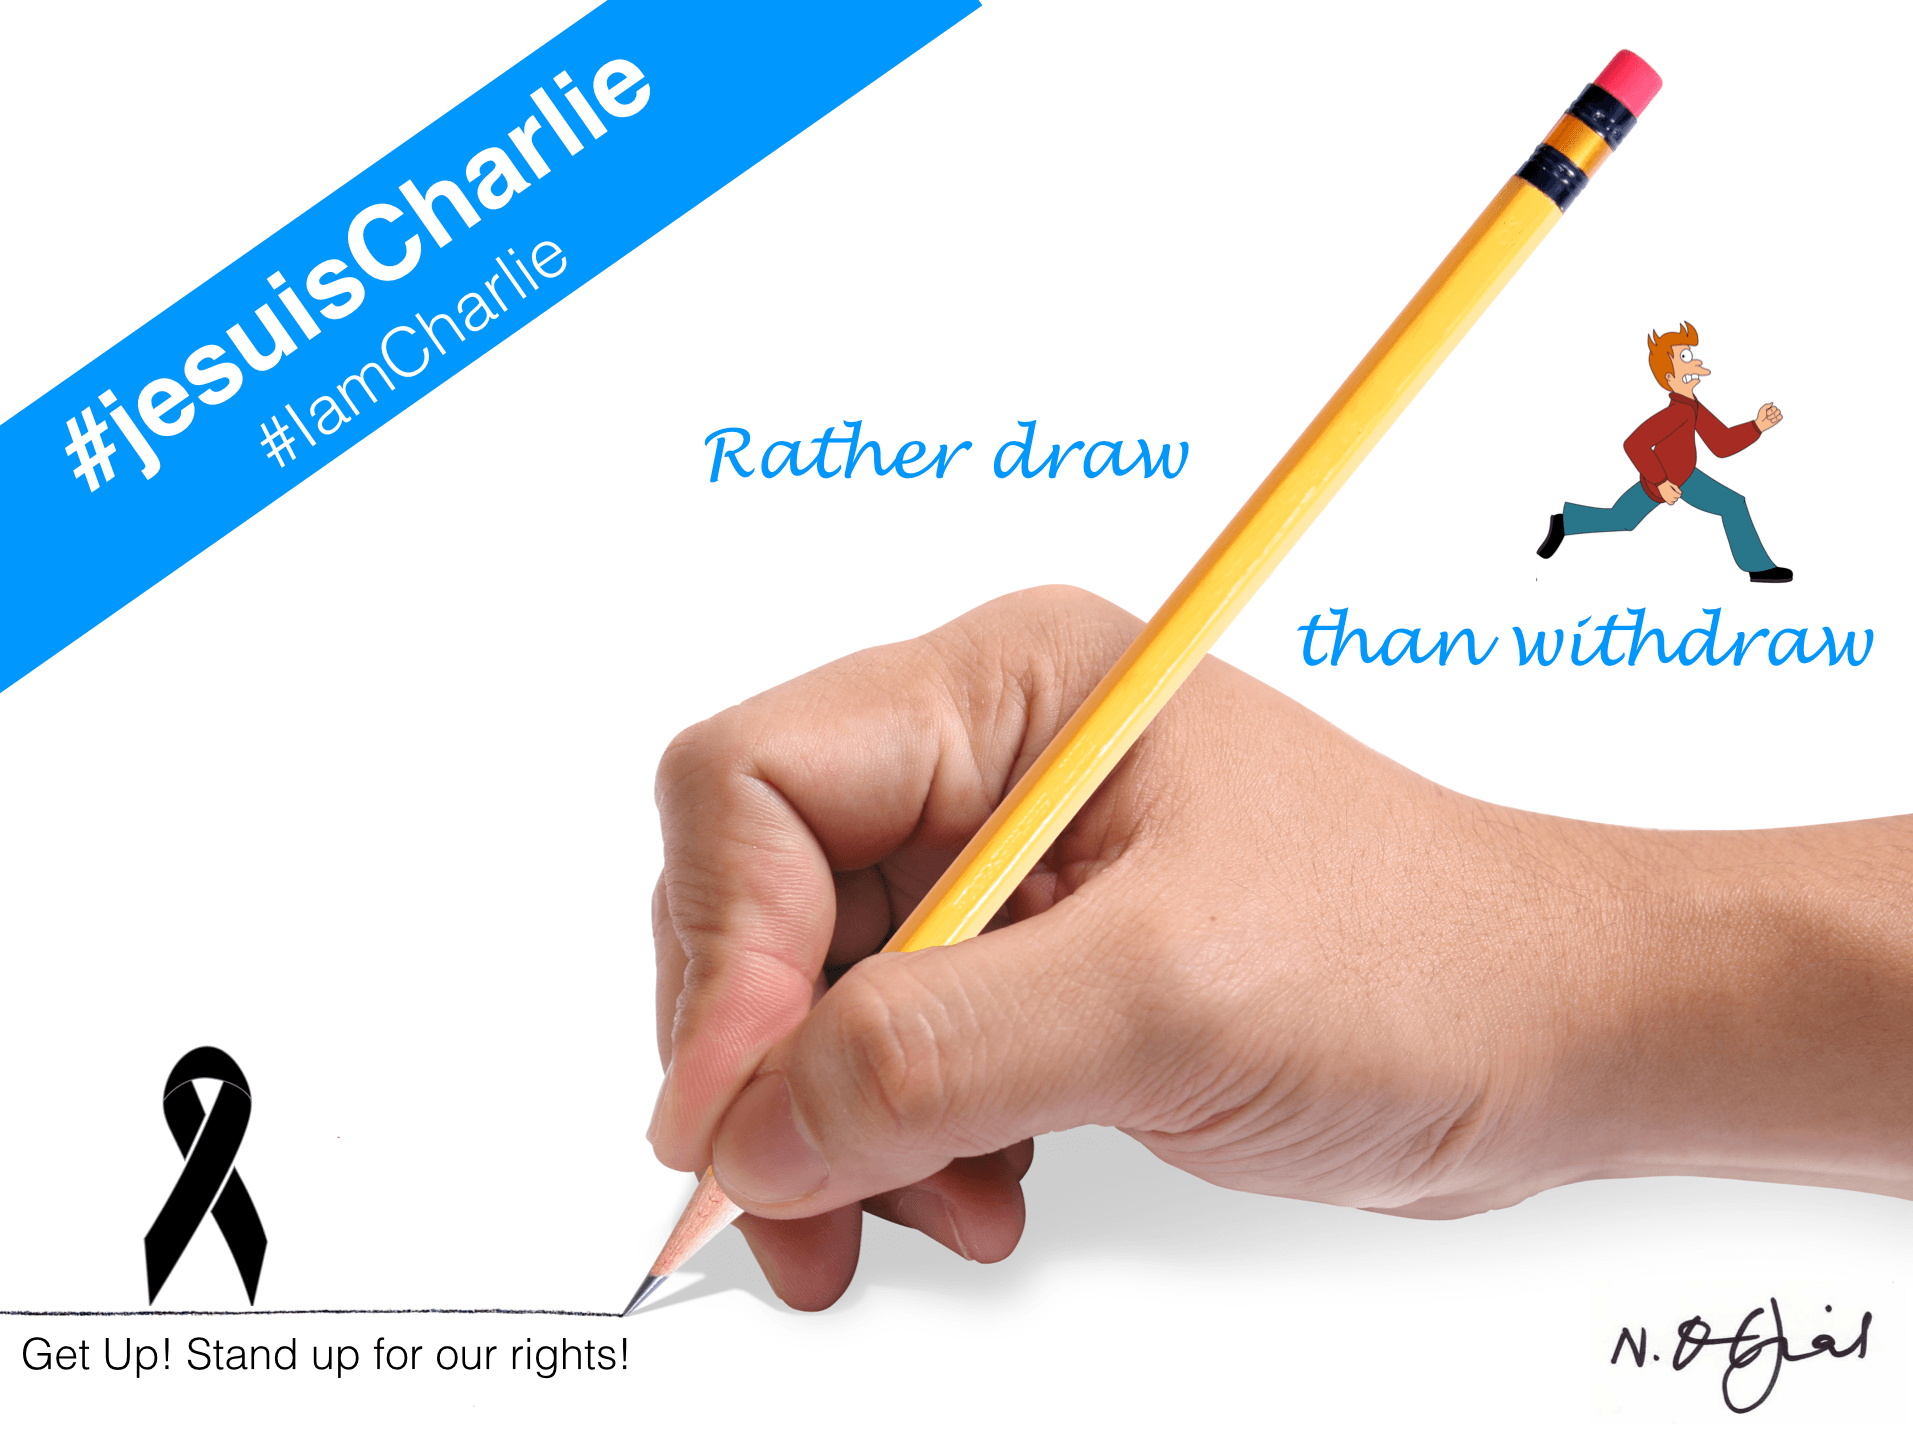 My second contribution to the Charlie Hebdo Massacre. #iamcharlie